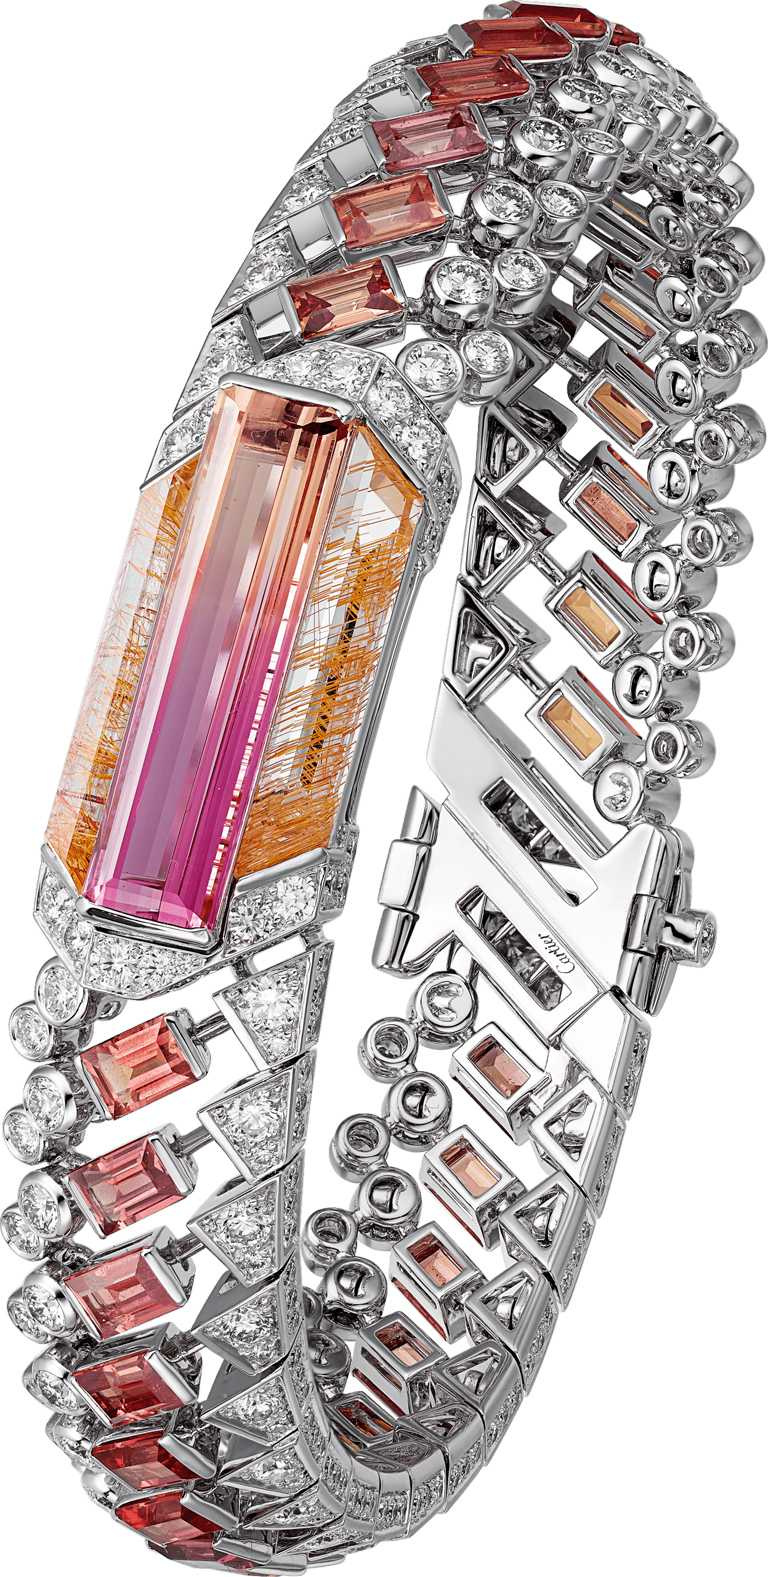 Cartier「MAGNITUDE」頂級珠寶系列「MAUNA」雙色帝王托帕石手環╱14,600,000元。(圖╱Cartier提供)